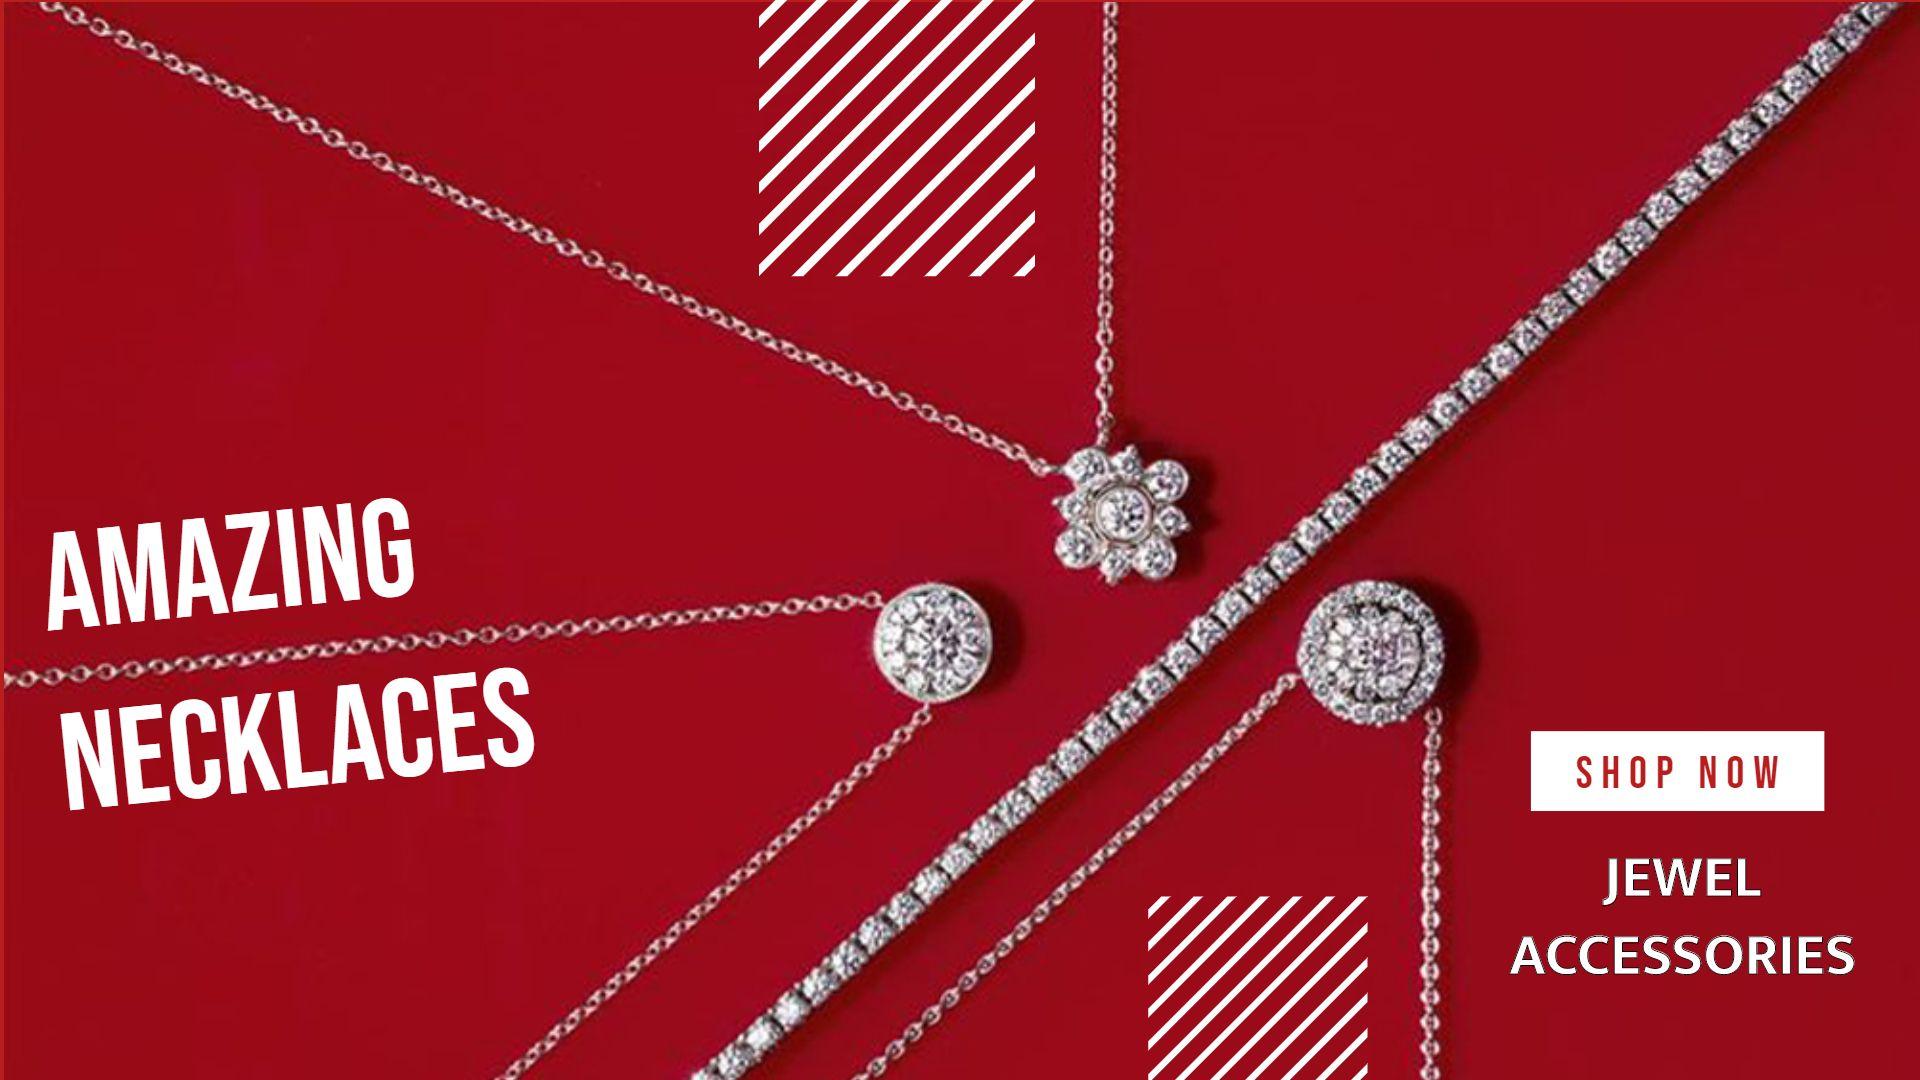 ودك بسلاسل ناعمة للدوام والطلعات شوفي اجملهم من قسم السلاسل سلاسل سلسال اكسسوارات جويل اكسسوريز Shop Necklaces Accessories Necklace Jewels